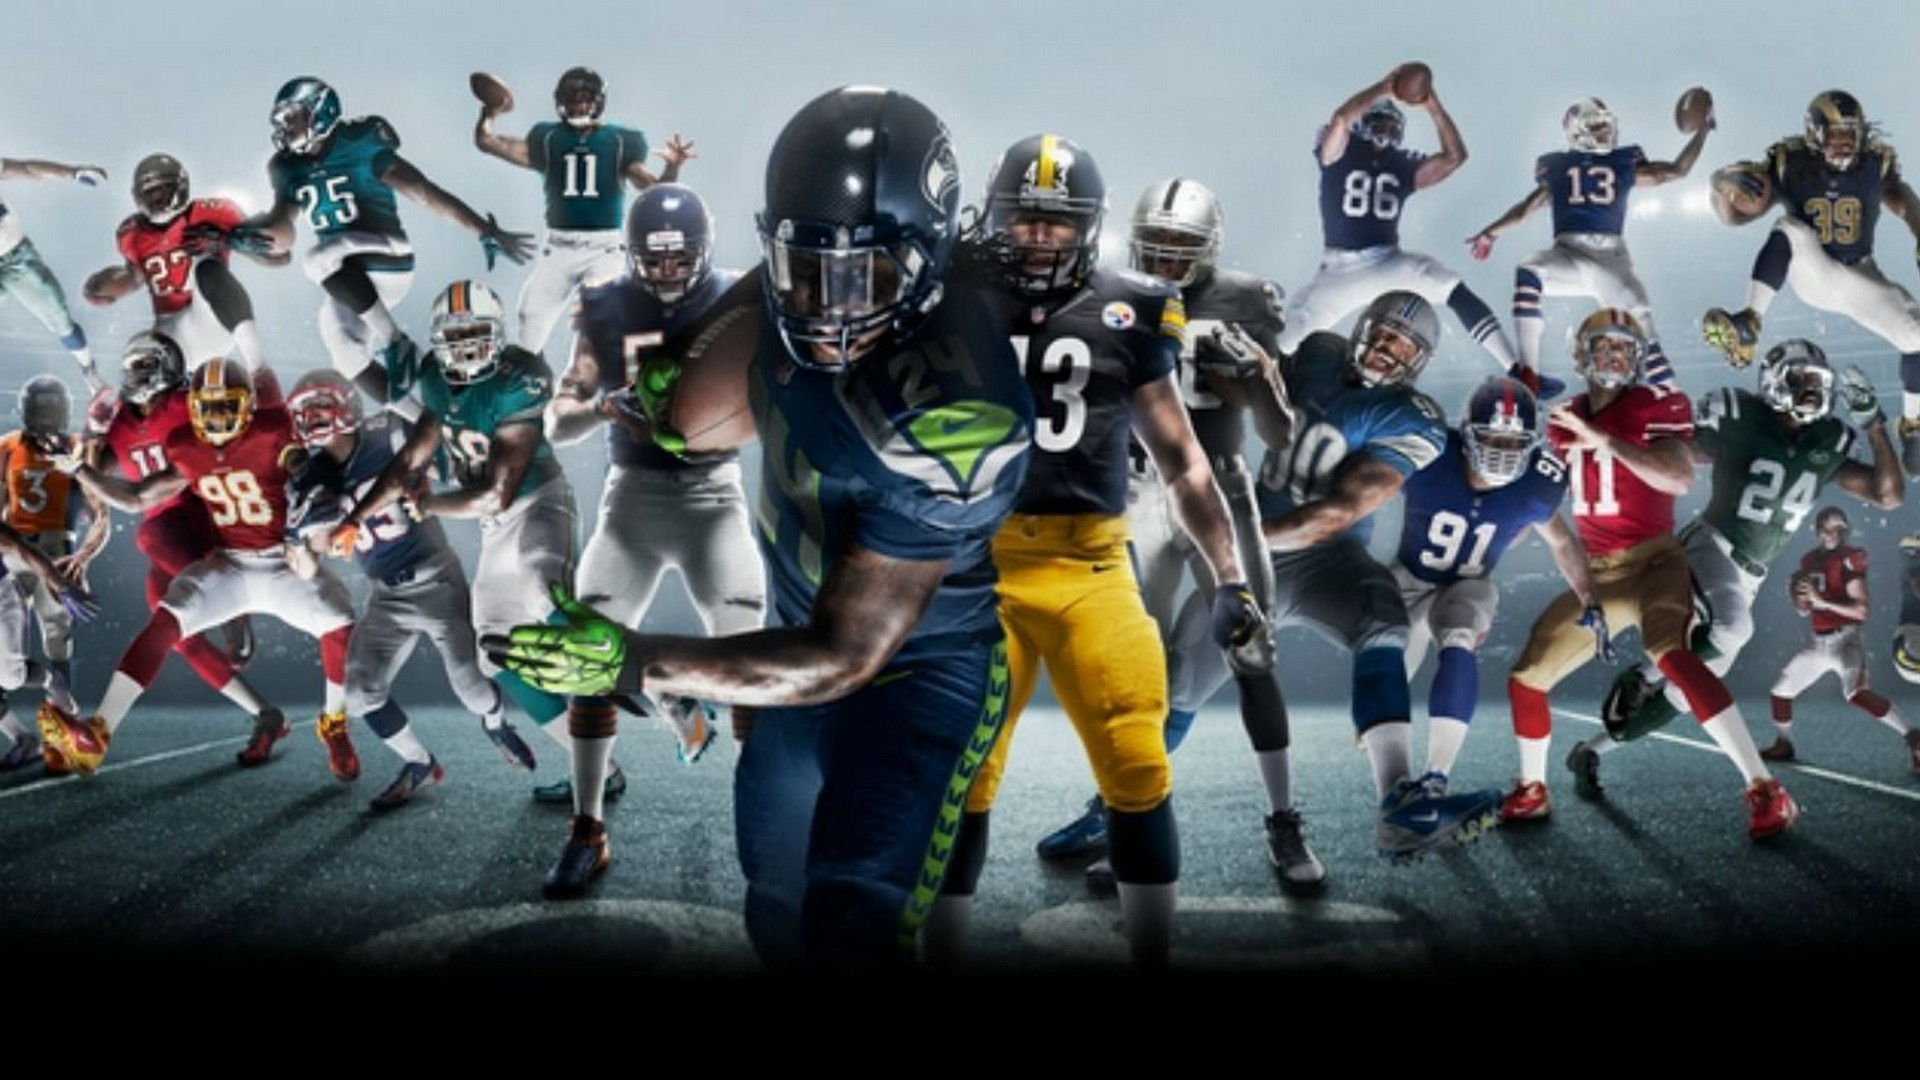 Cool Pictures Of Nfl Players Search: Preparen Su Consola: ¡Uniformes Y Festejos De La NFL